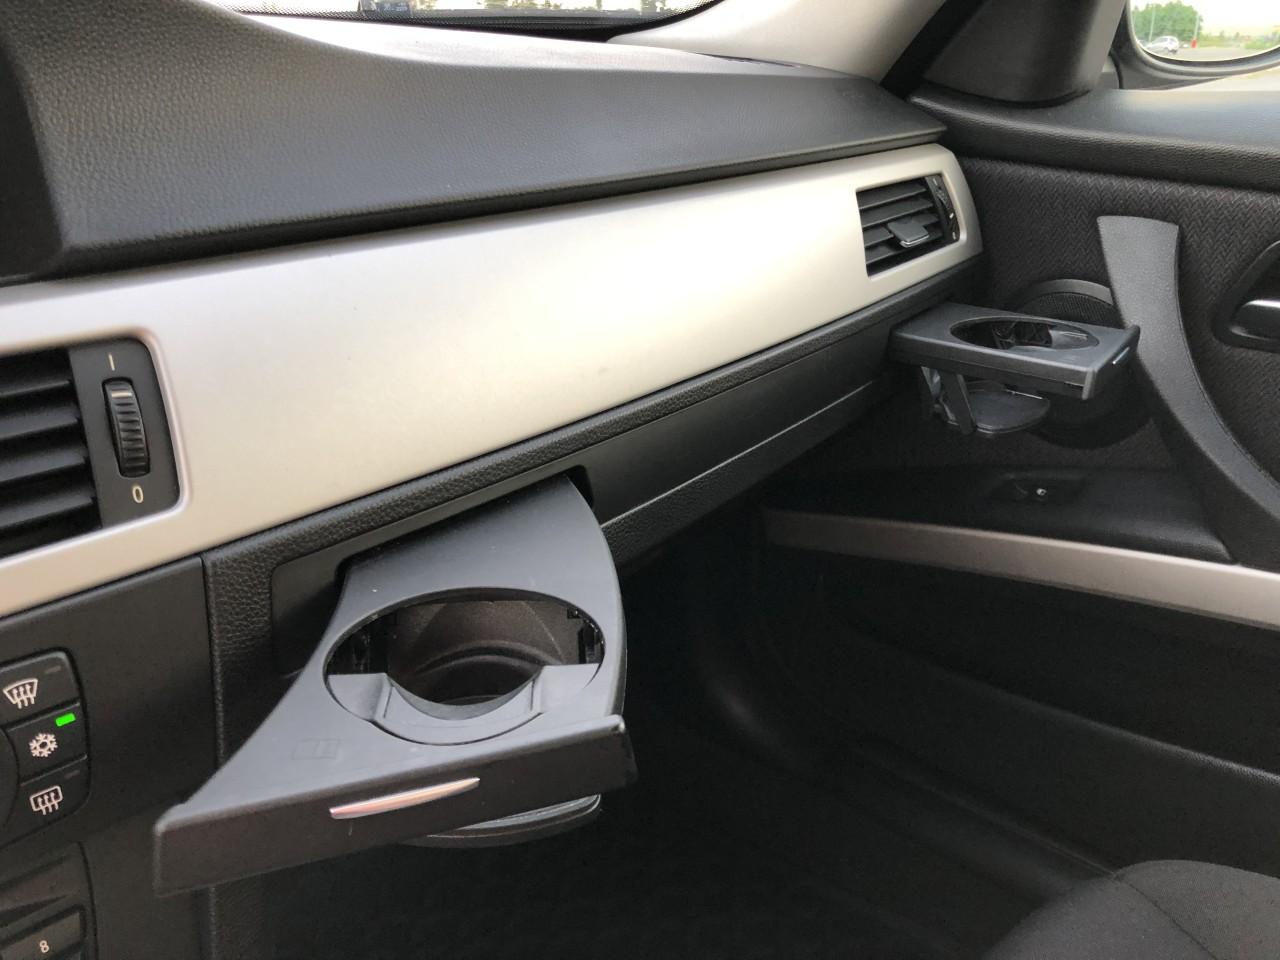 BMW 320 BMW 320D 177Cp Euro 5 /M-Pachet EXTERIOR /Automata / Navigatie / RECENT ADUSA DIN GERMANIA!!! 2009